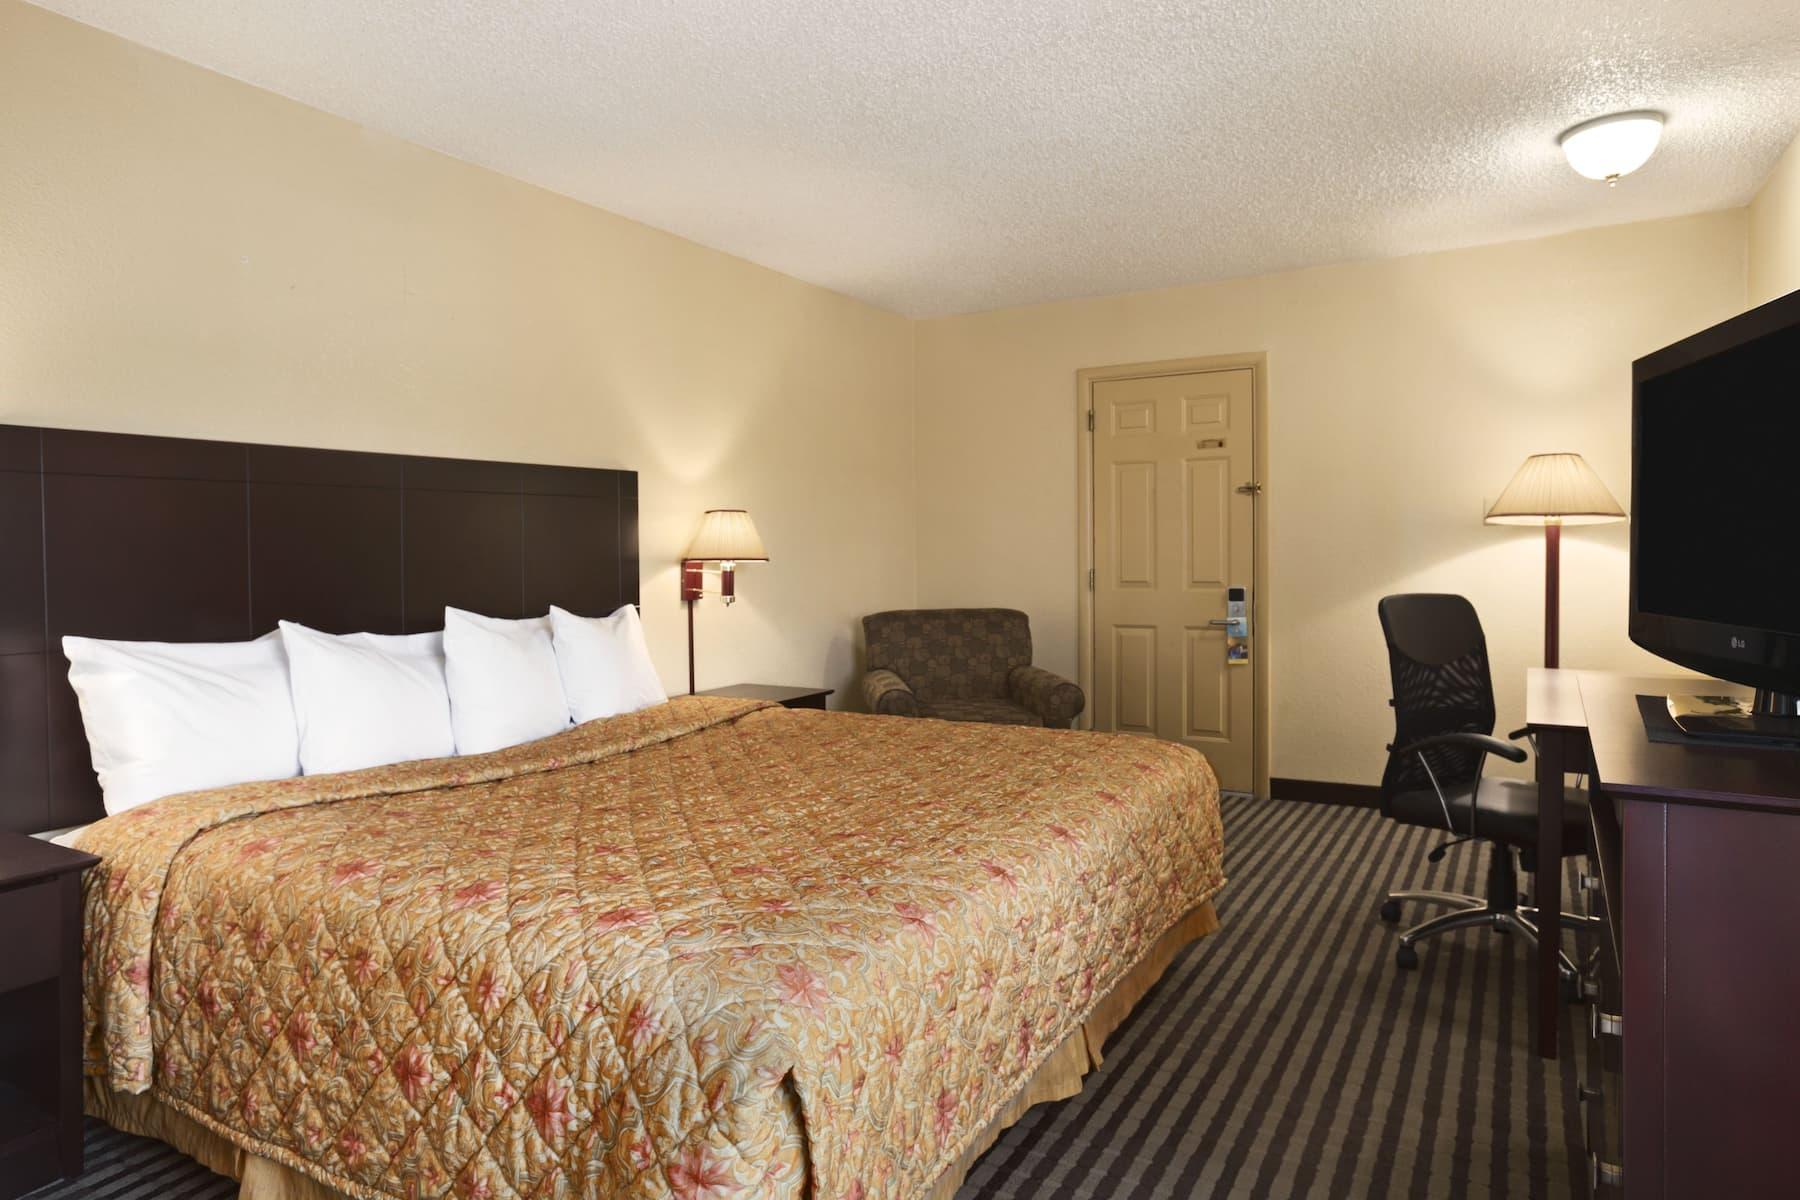 Days Inn By Wyndham Champaign Urbana Champaign Il Hotels